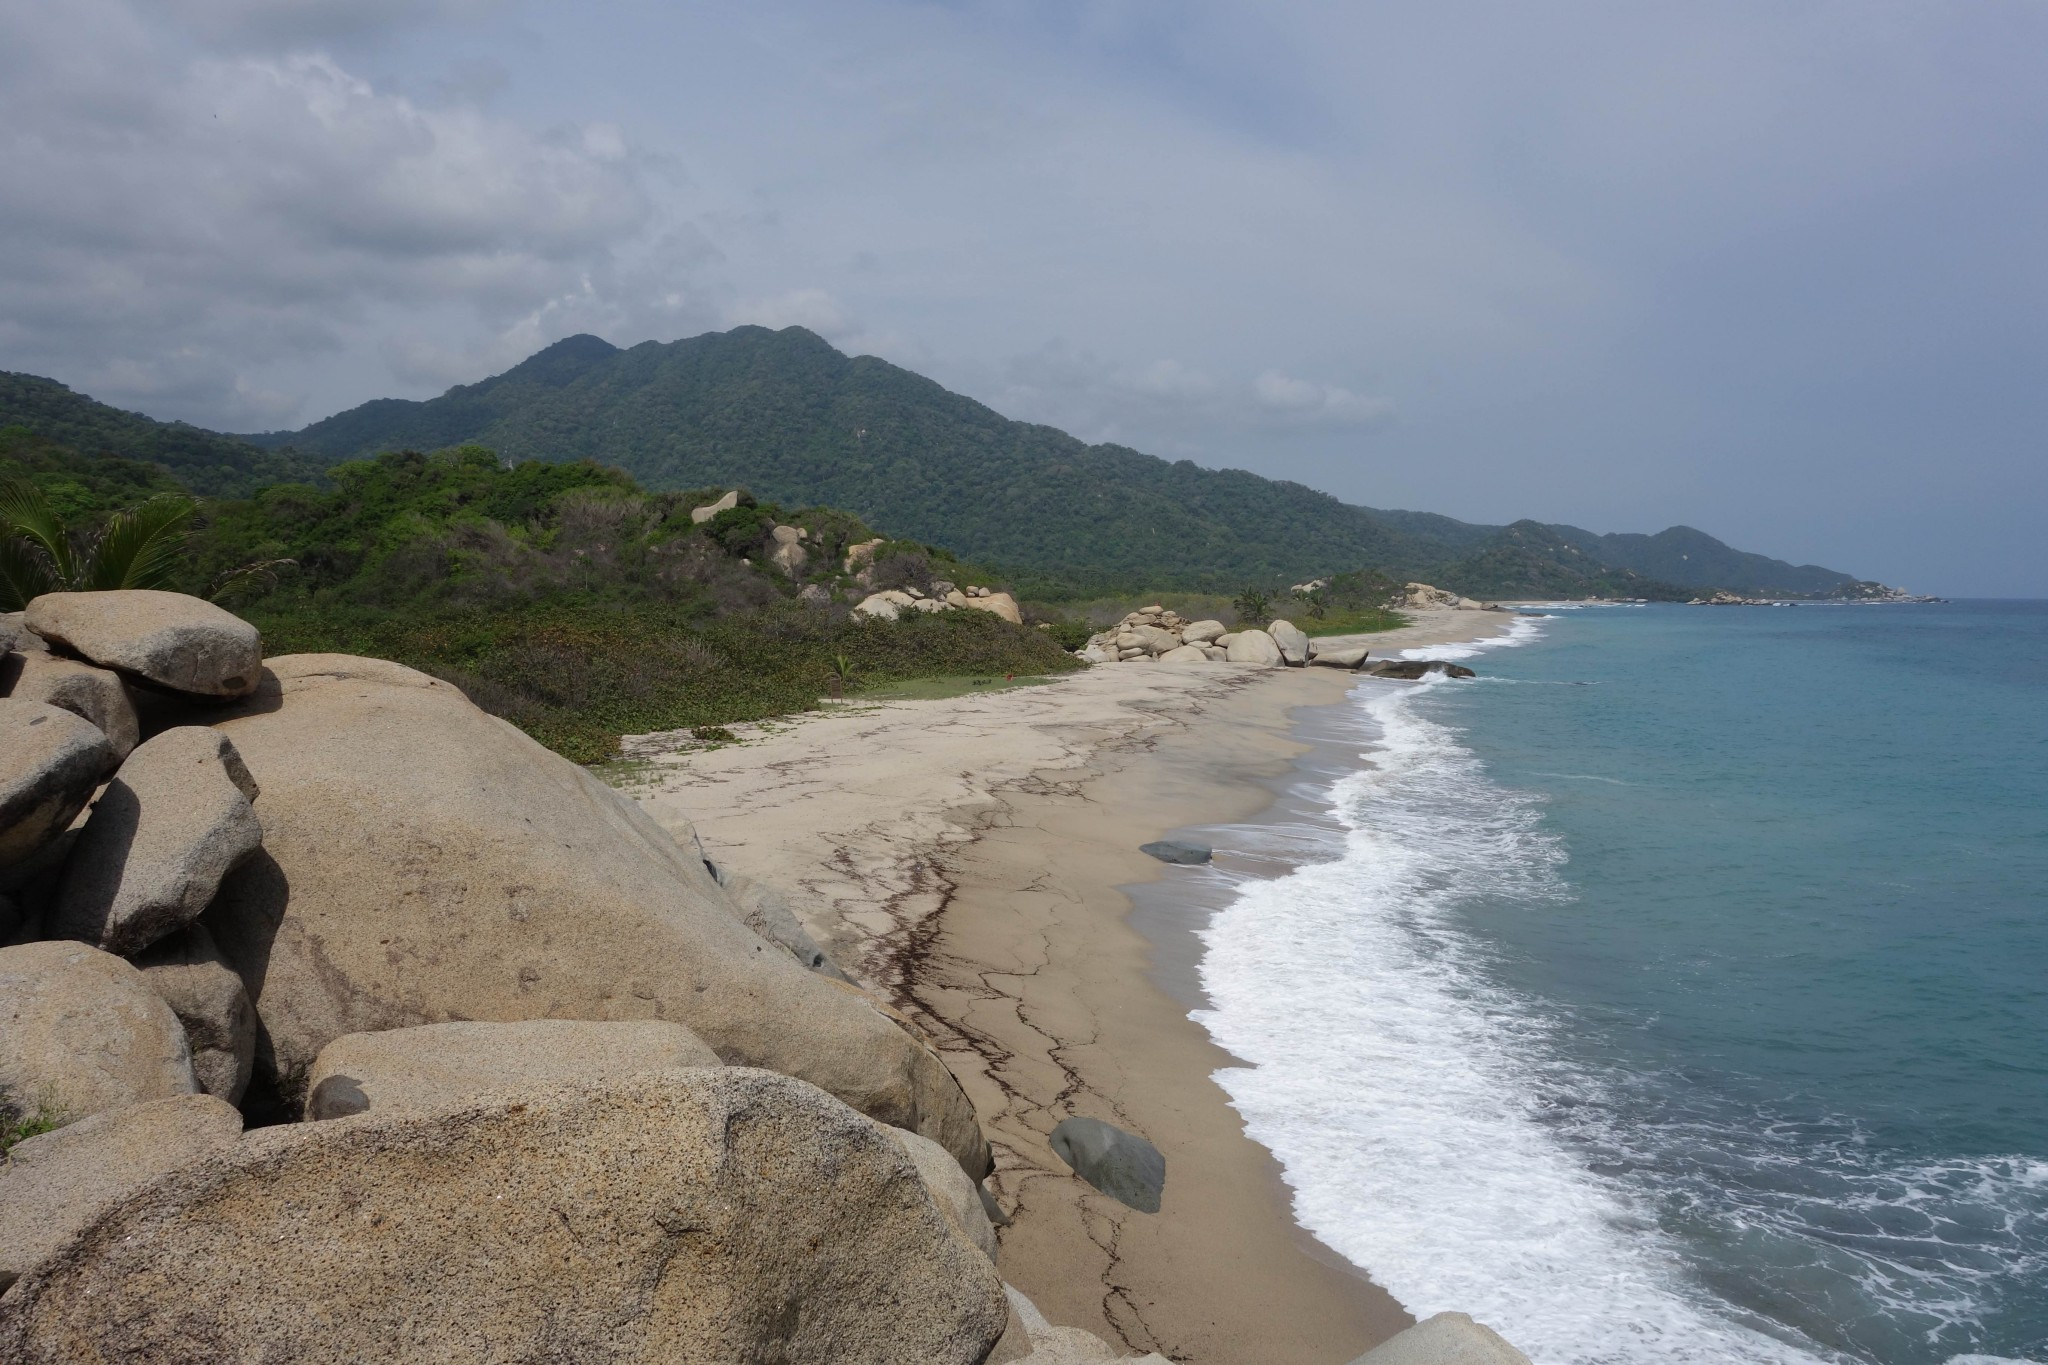 Parque Tayrona Blick vom Felsen auf den Strand